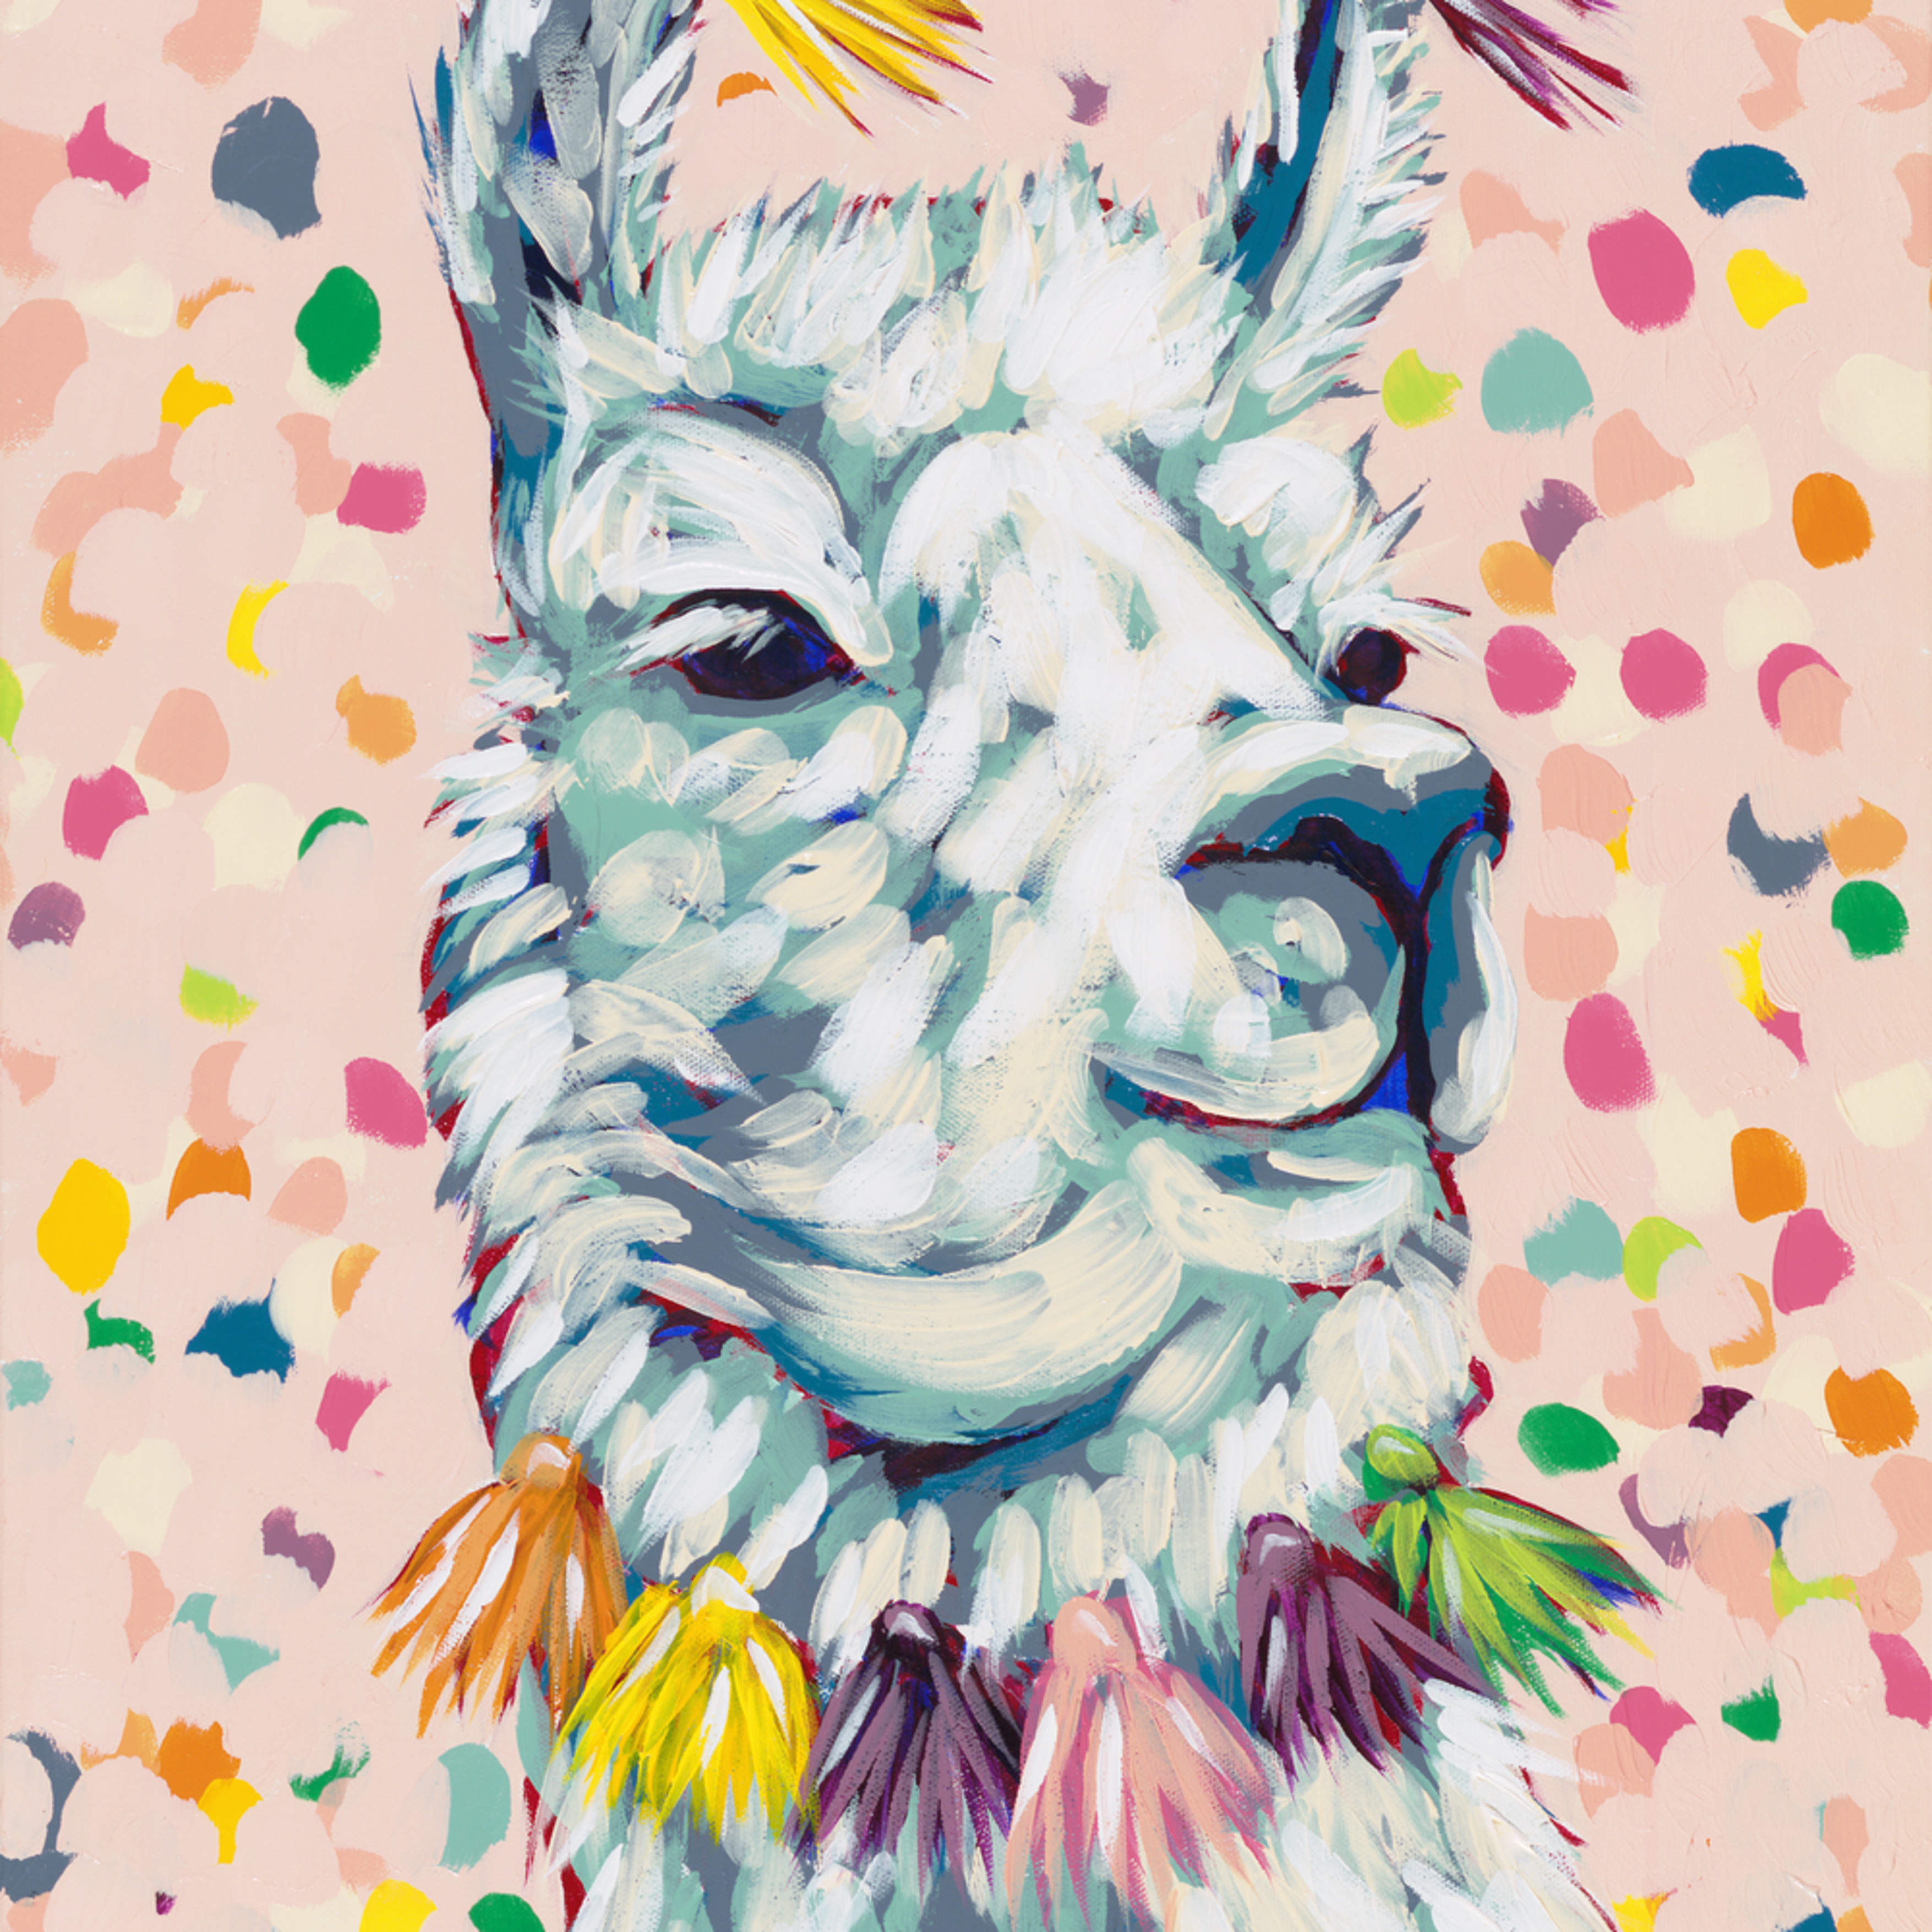 Jodi augustine drama llama pink asf vlxstz